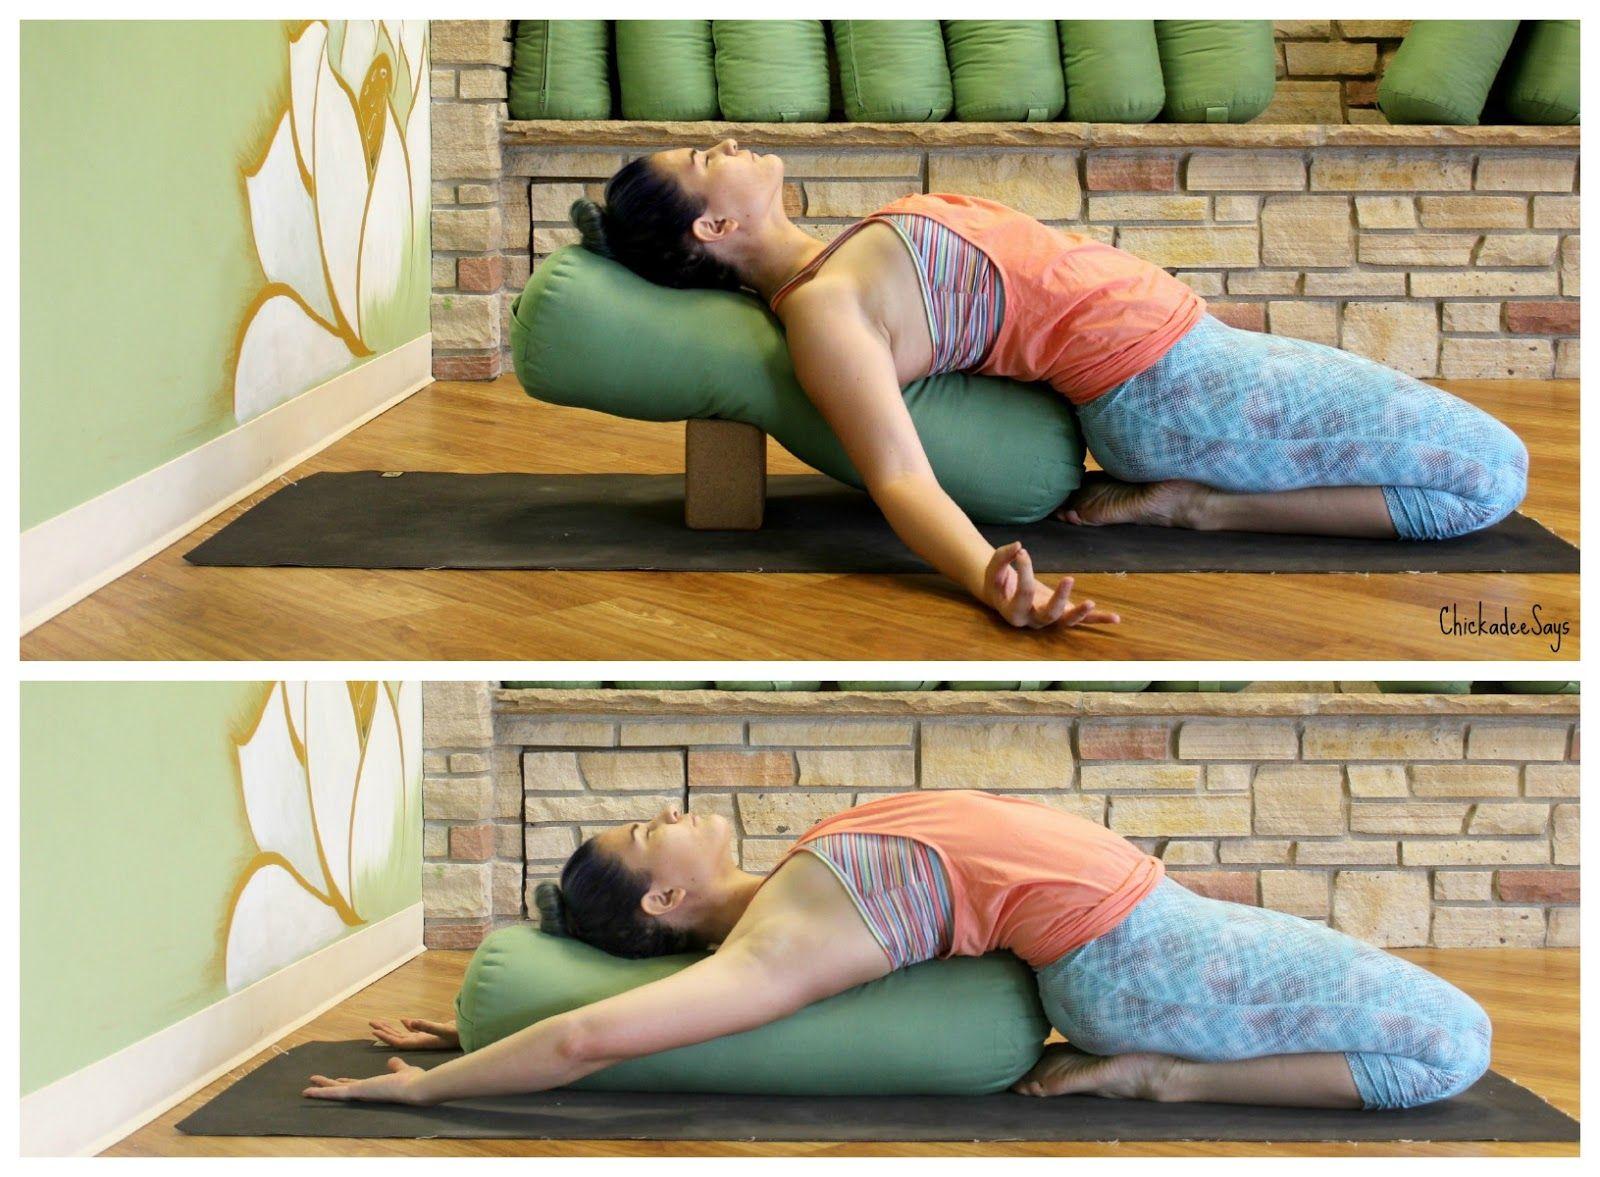 Chickadee Says: 8 Favorite Restorative Yoga Poses